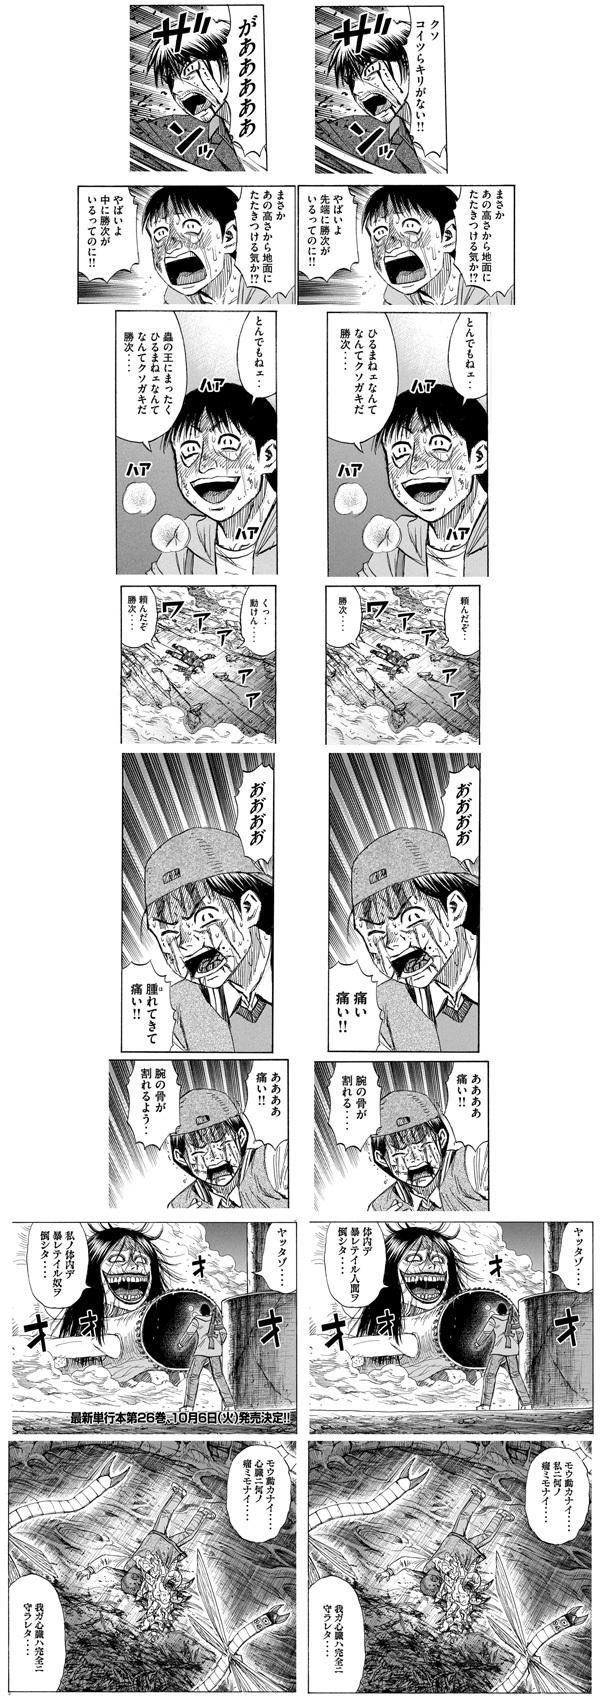 higanjima_48nichigo27-21012503.jpg